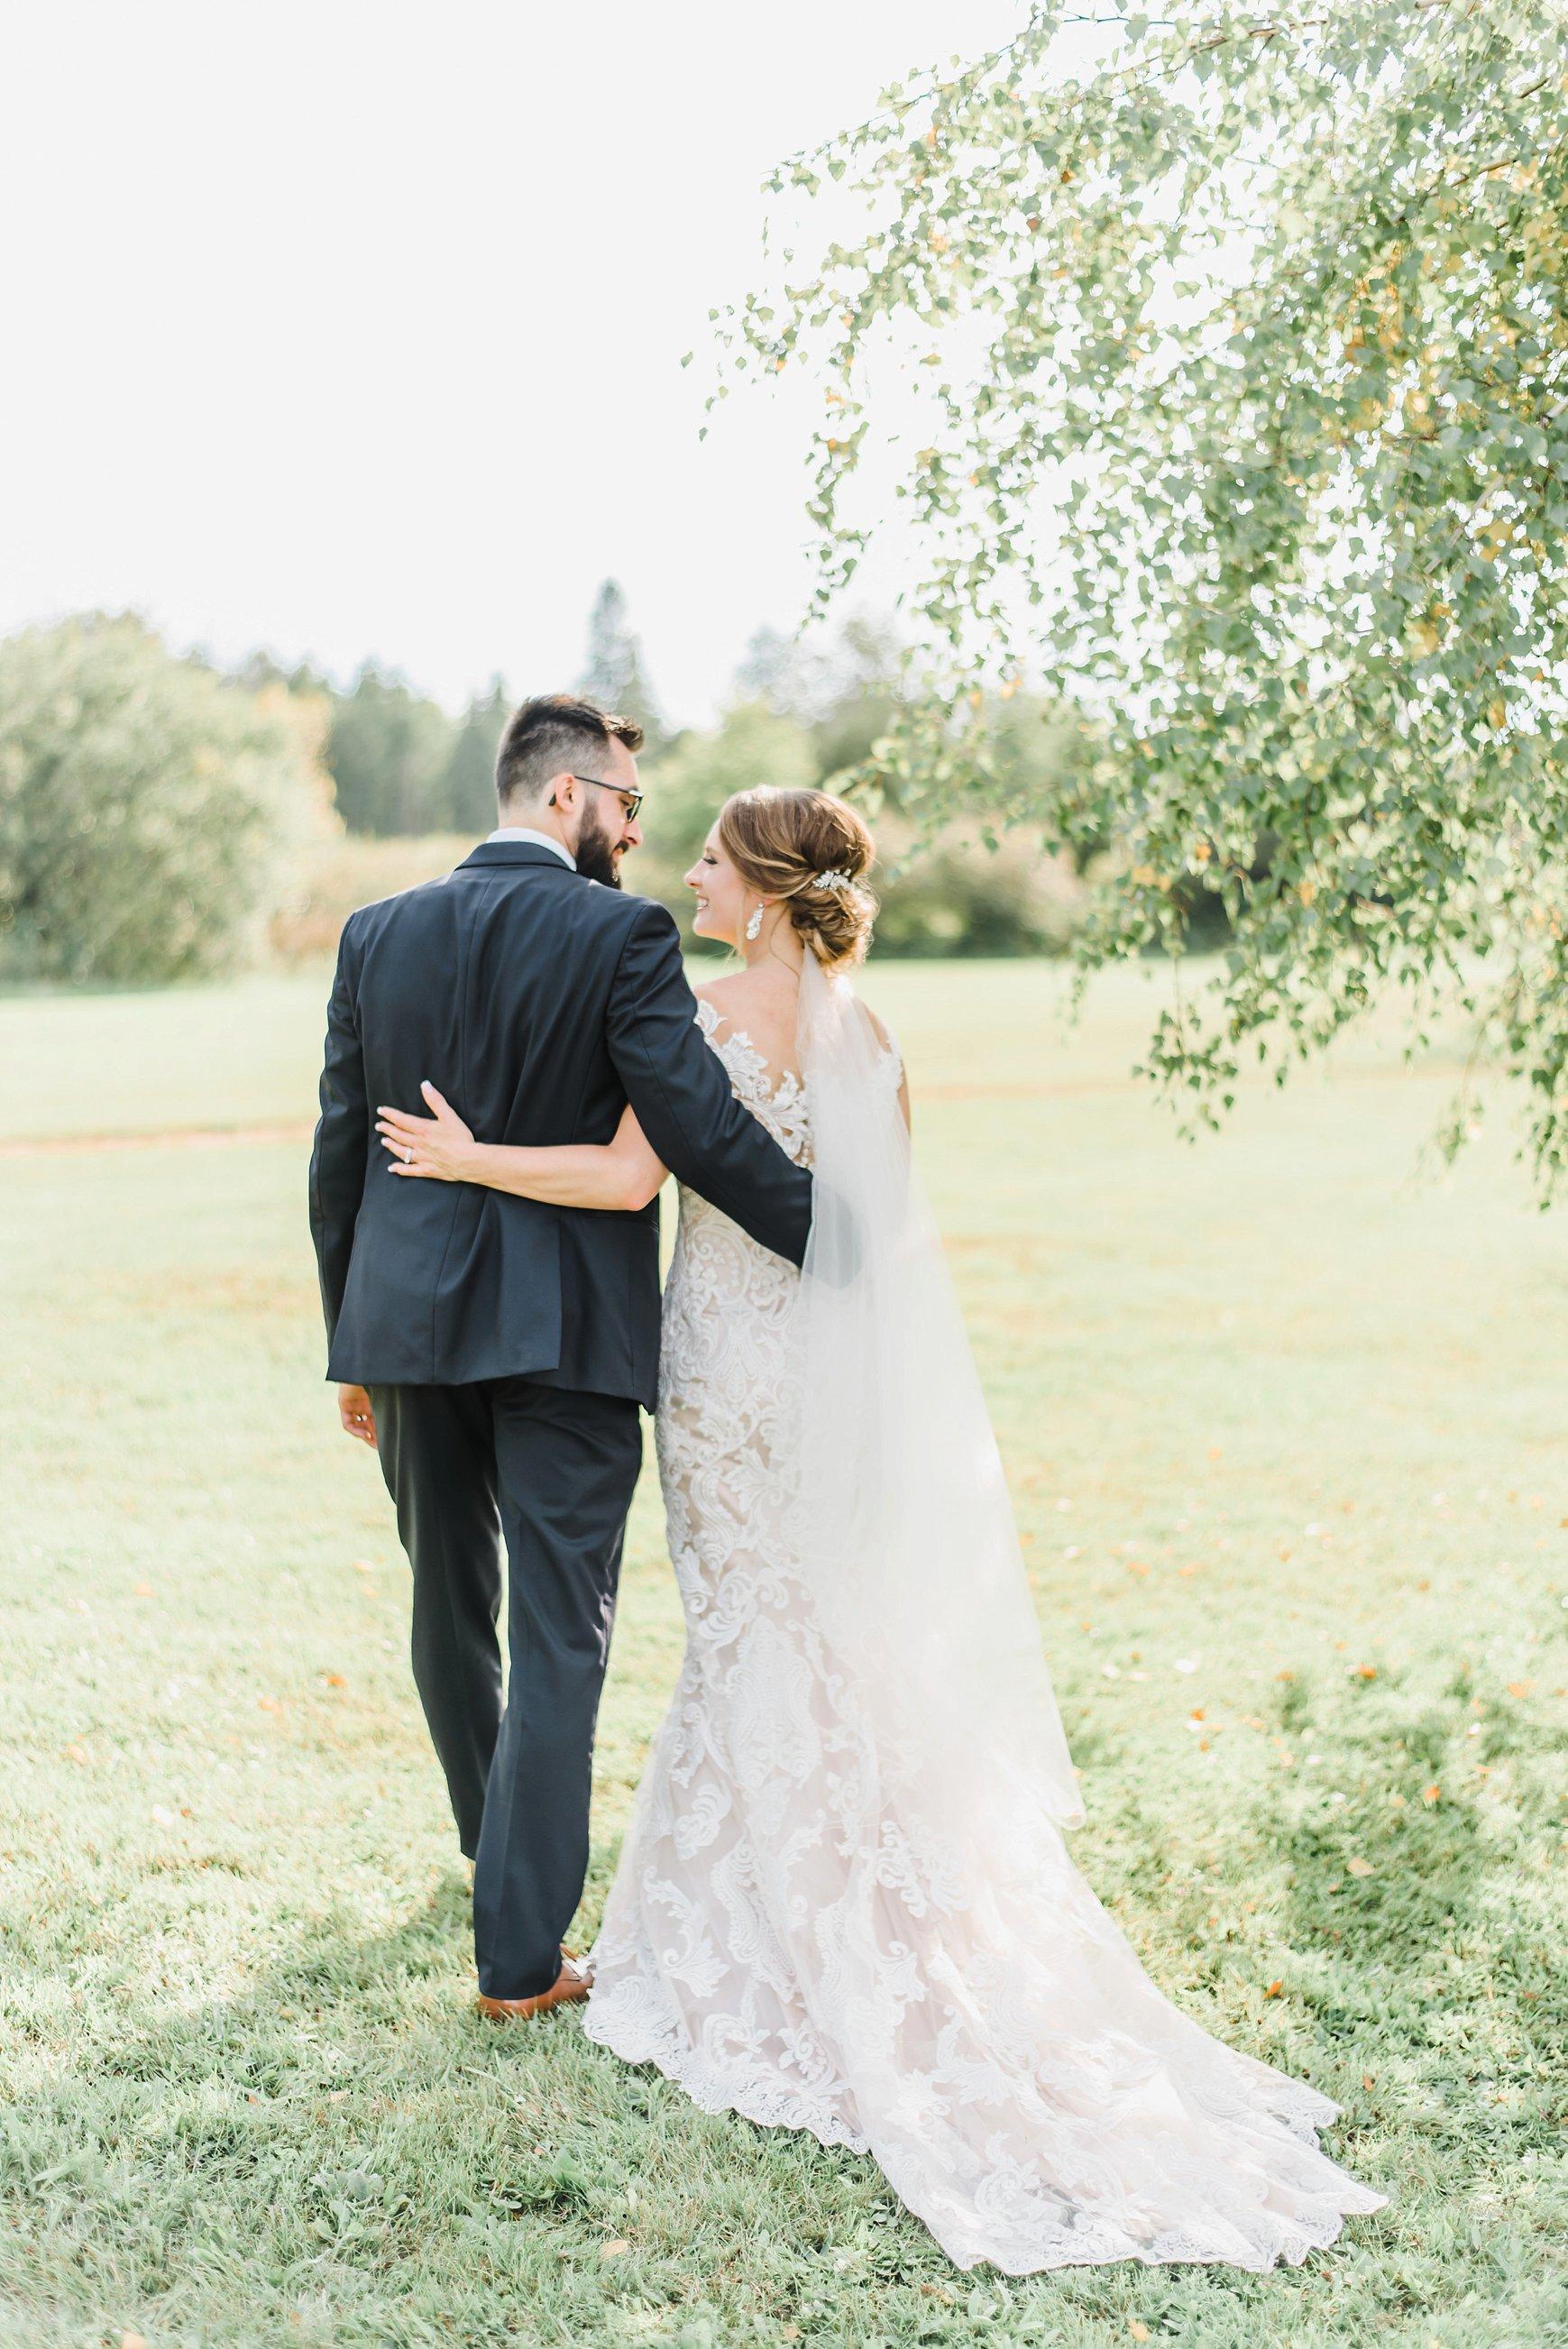 light airy indie fine art ottawa wedding photographer | Ali and Batoul Photography_1304.jpg